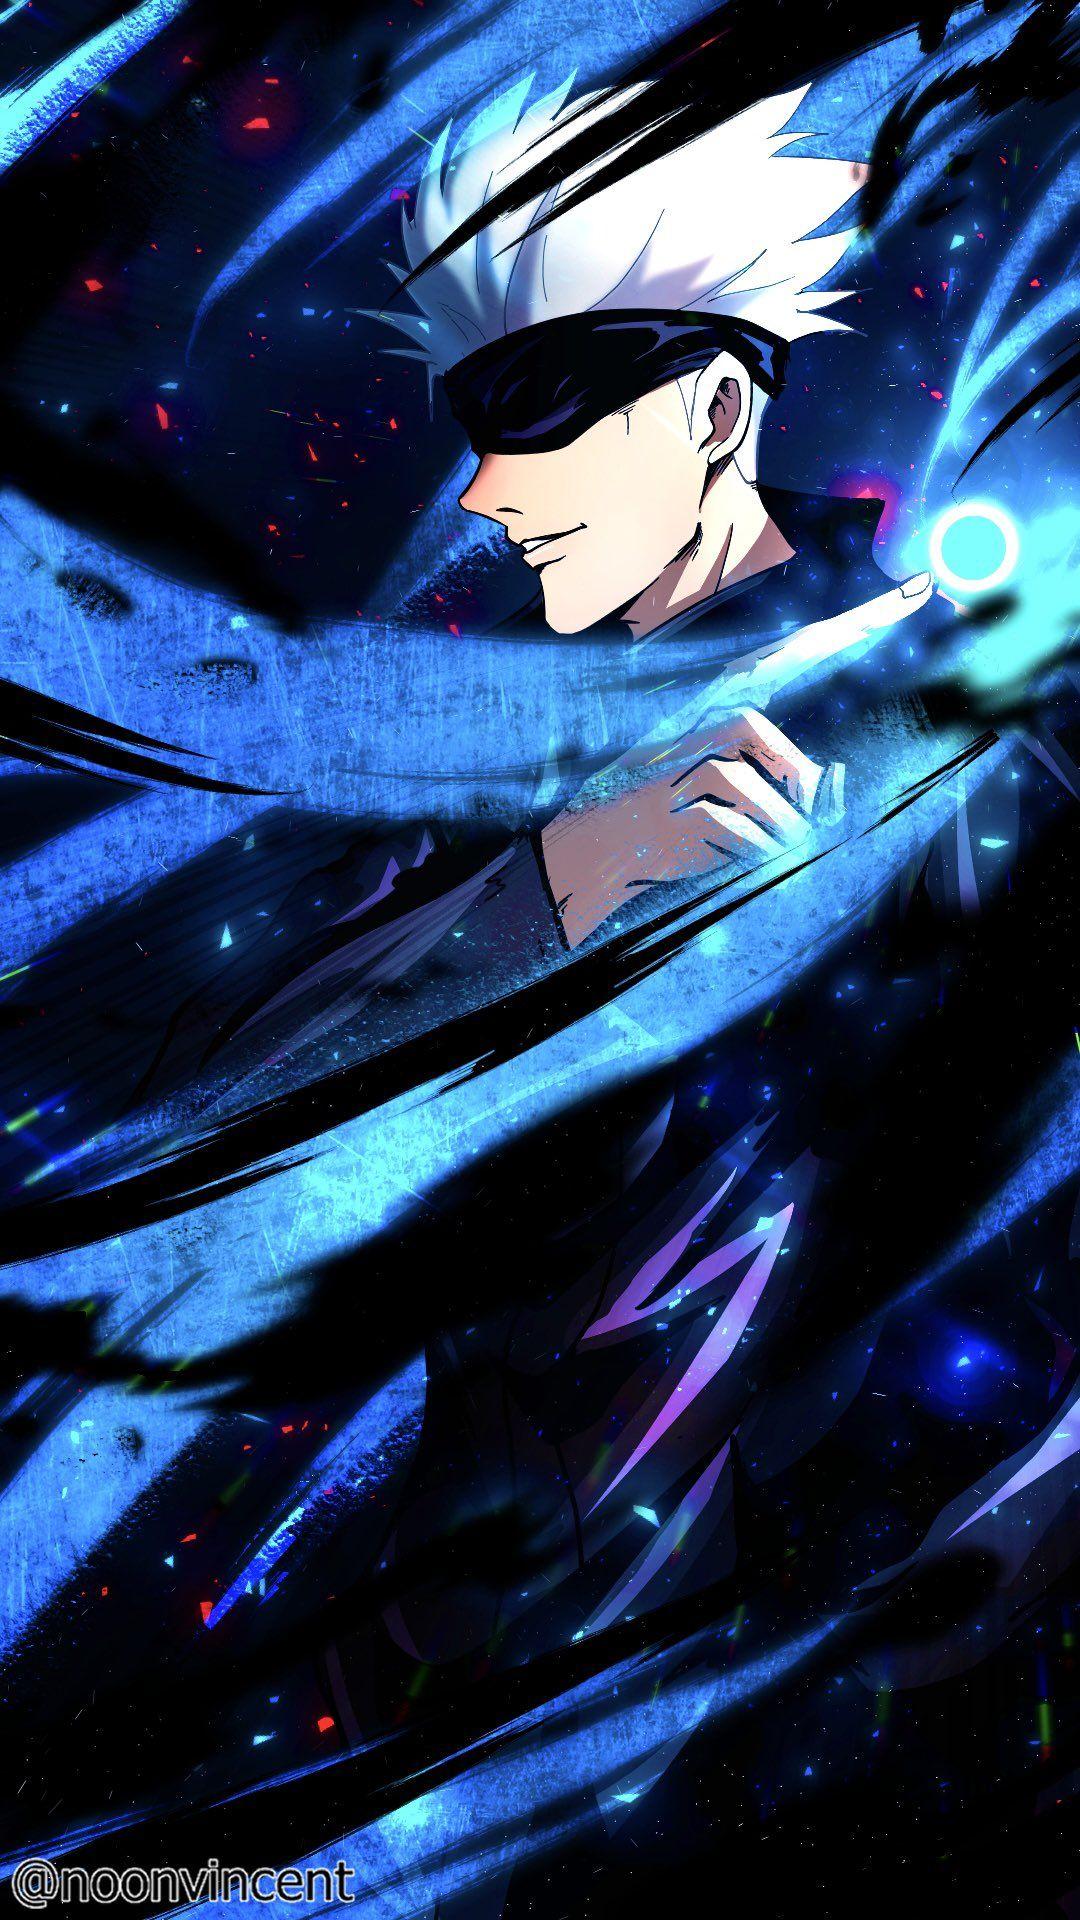 Jujutsu Kaisen Satoru Gojo By Noonvincent Personagens De Anime Animes Wallpapers Filmes De Anime